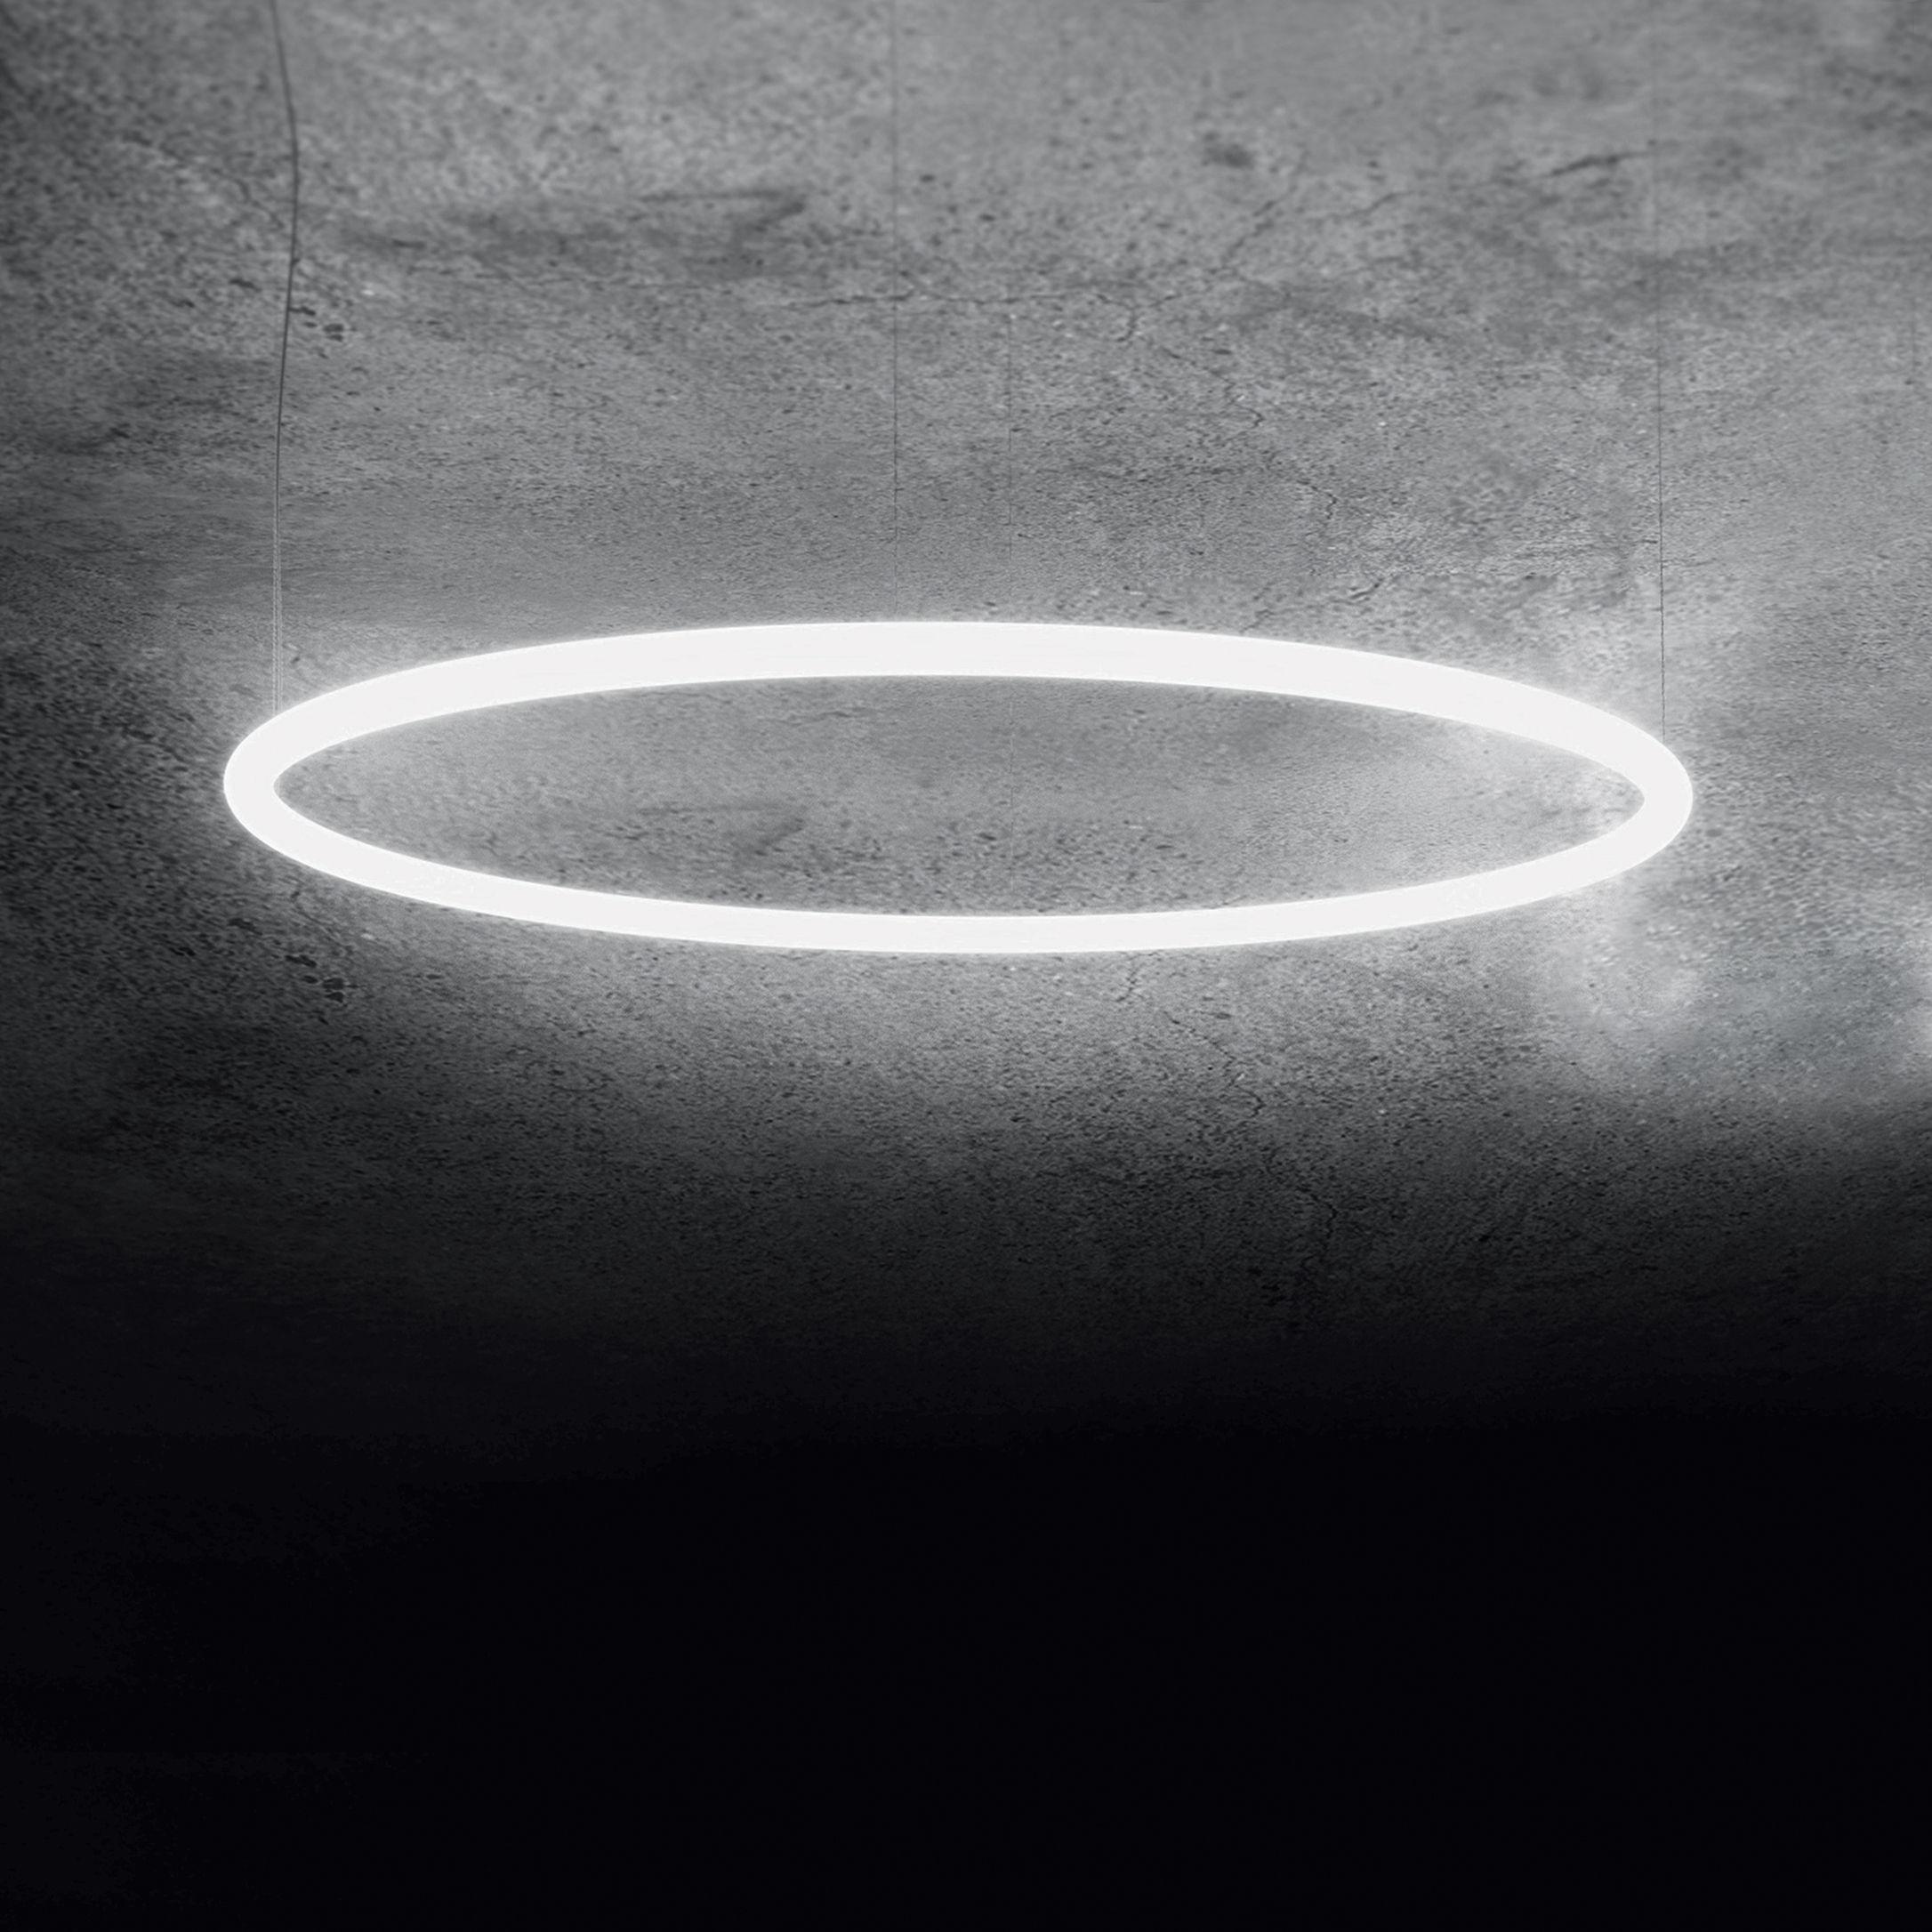 Illuminazione - Lampadari - Sospensione Alphabet of light - / Circolare - Ø 90 cm di Artemide - bianco / Ø 90 cm - Alluminio, Metacrilato